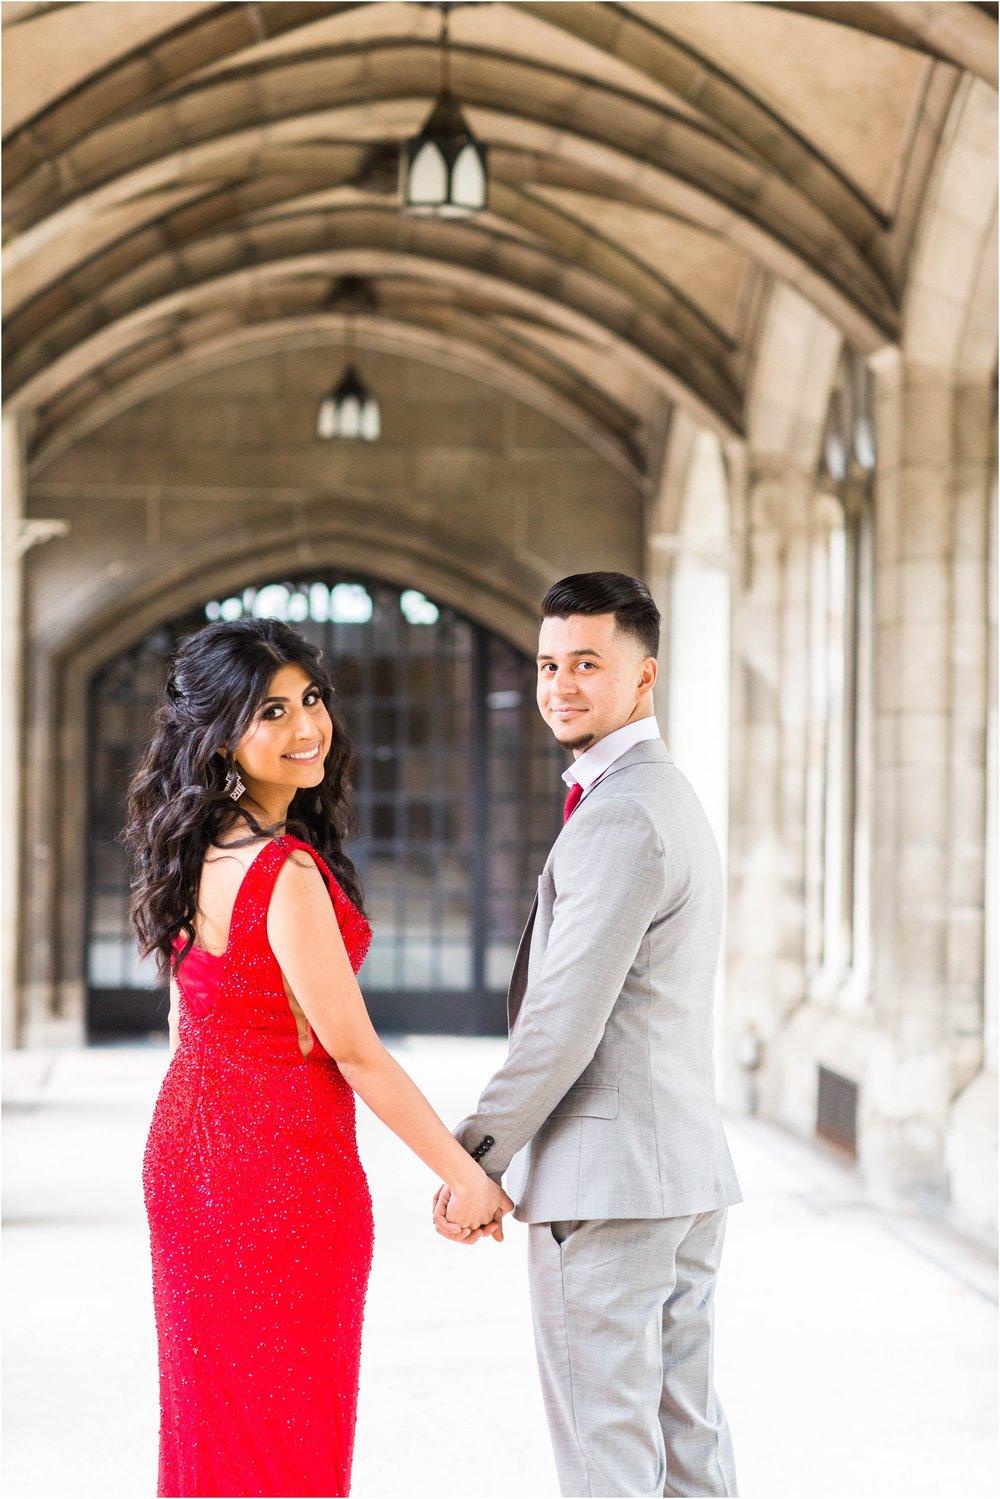 Knox-College-U-of-T-University-of-Toronto-Distillery-District-Engagement-Session-Toronto-Mississauga-Brampton-Scarborough-GTA-Pakistani-Indian-Wedding-Engagement-Photographer-Photography_0002.jpg